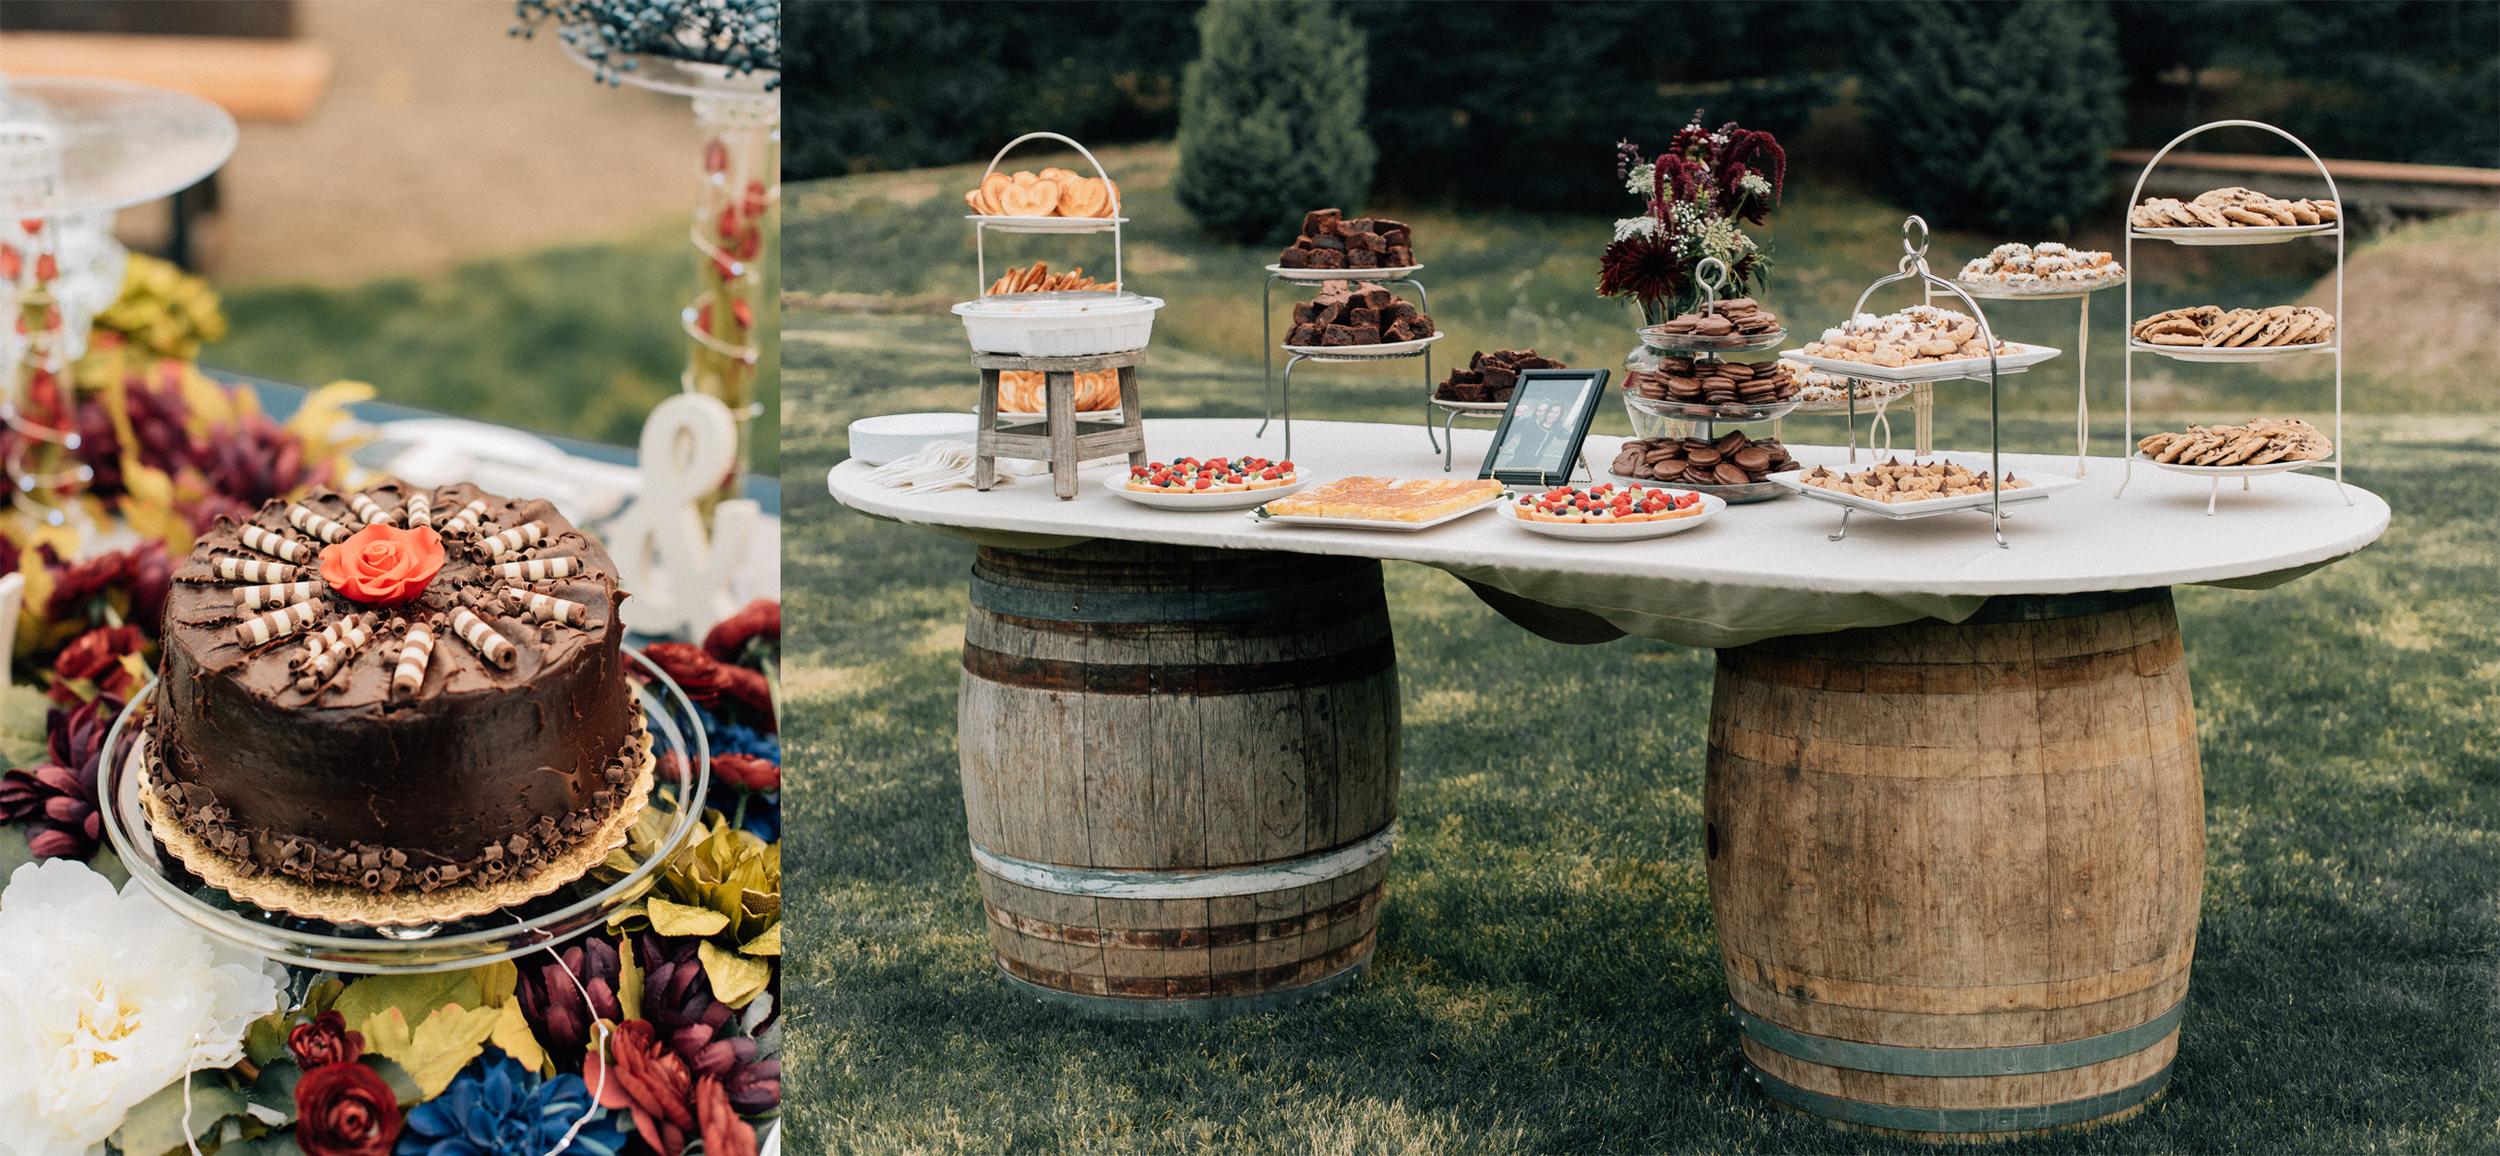 Liza James Photography | Portland Wedding Photographer BLOG 18.png